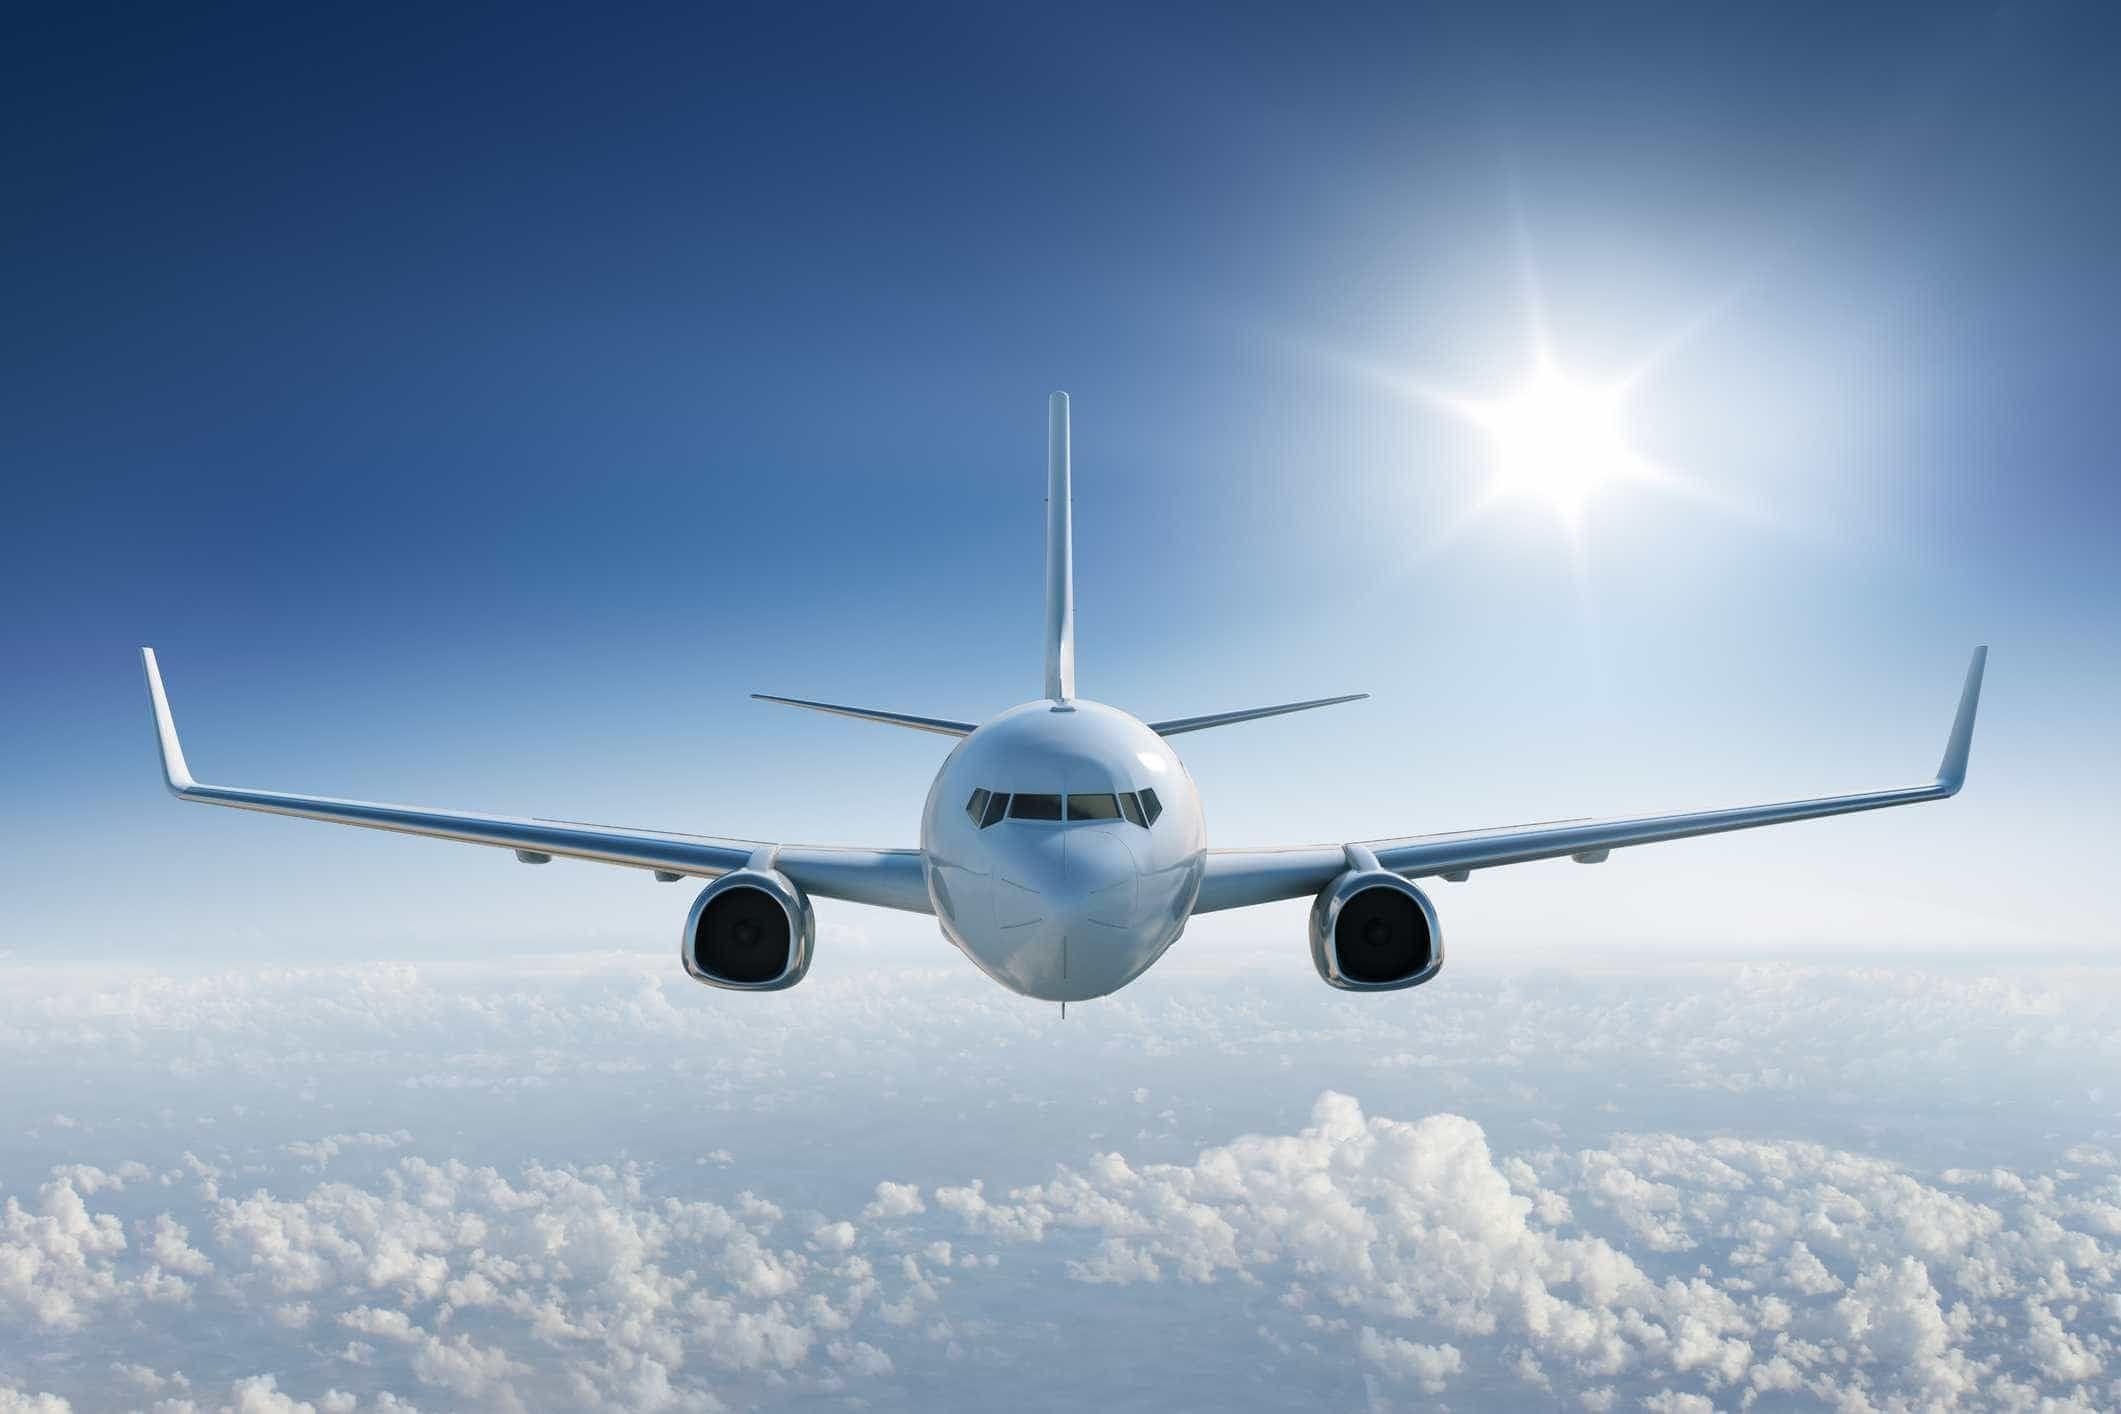 Sobe número de companhias que suspendem voos do Boeing 737 MAX 8